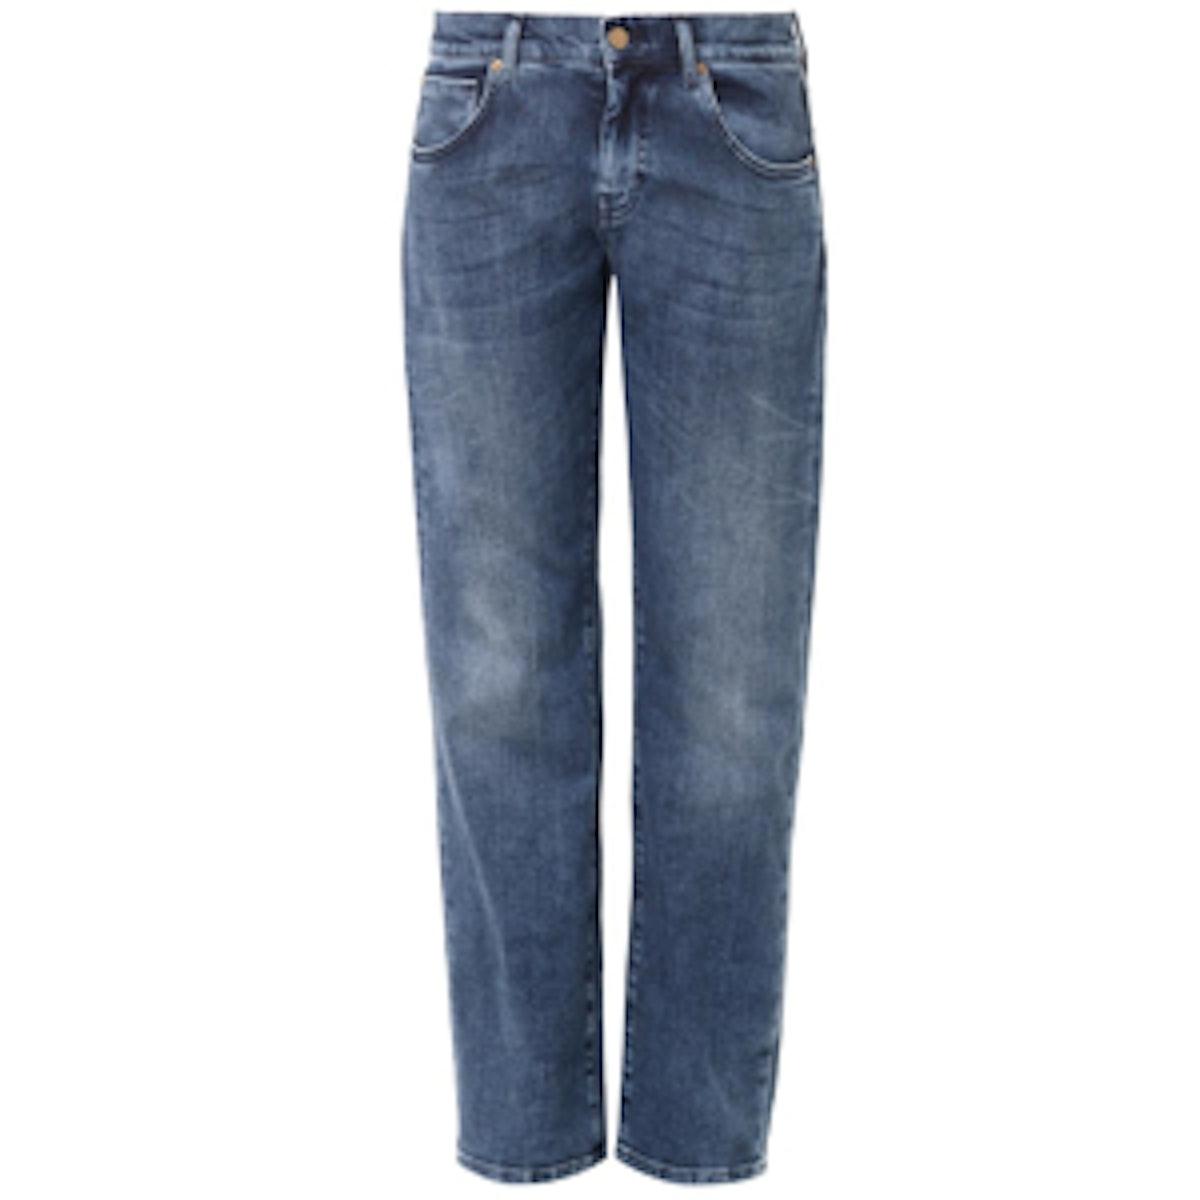 Low-Slung Boyfriend Jeans